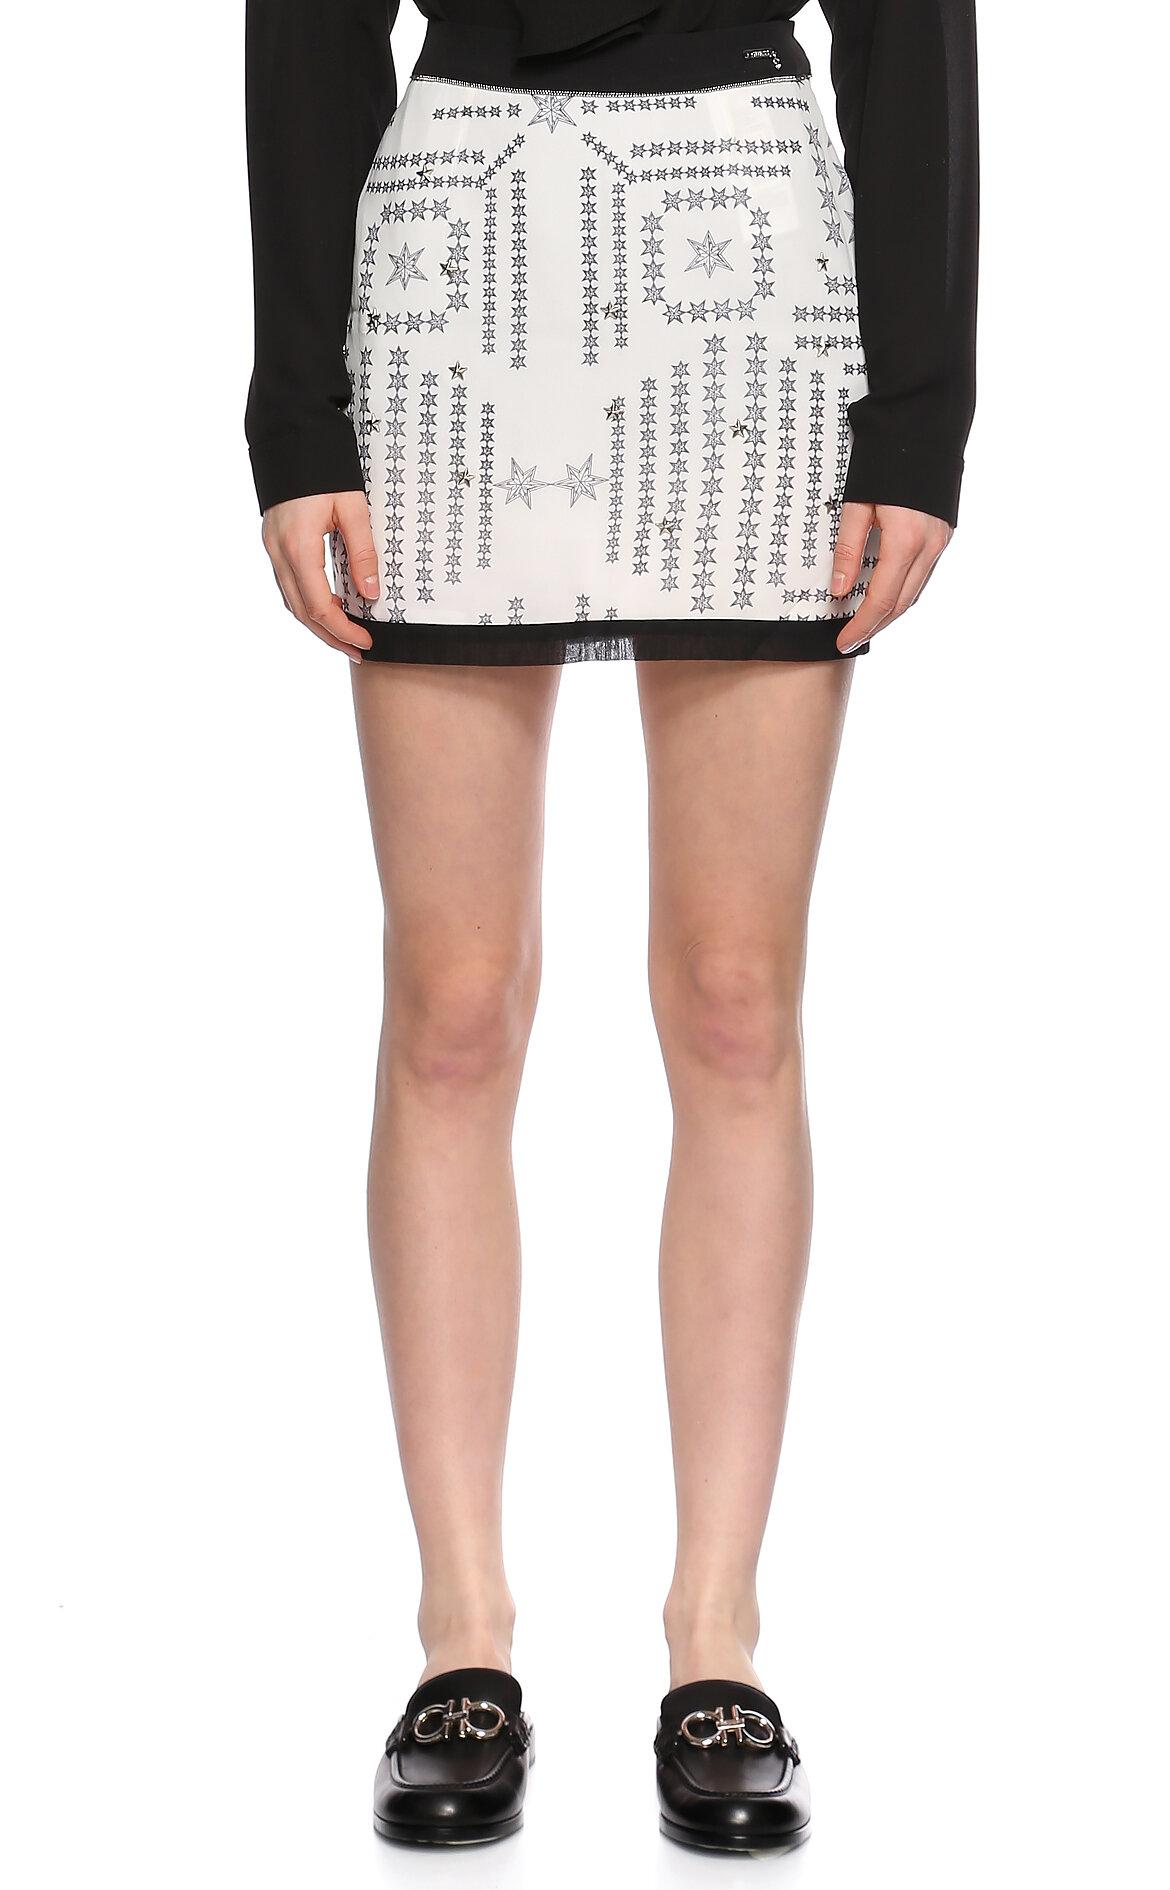 Guess-Guess Yıldız Desenli Beyaz Siyah Mini Etek